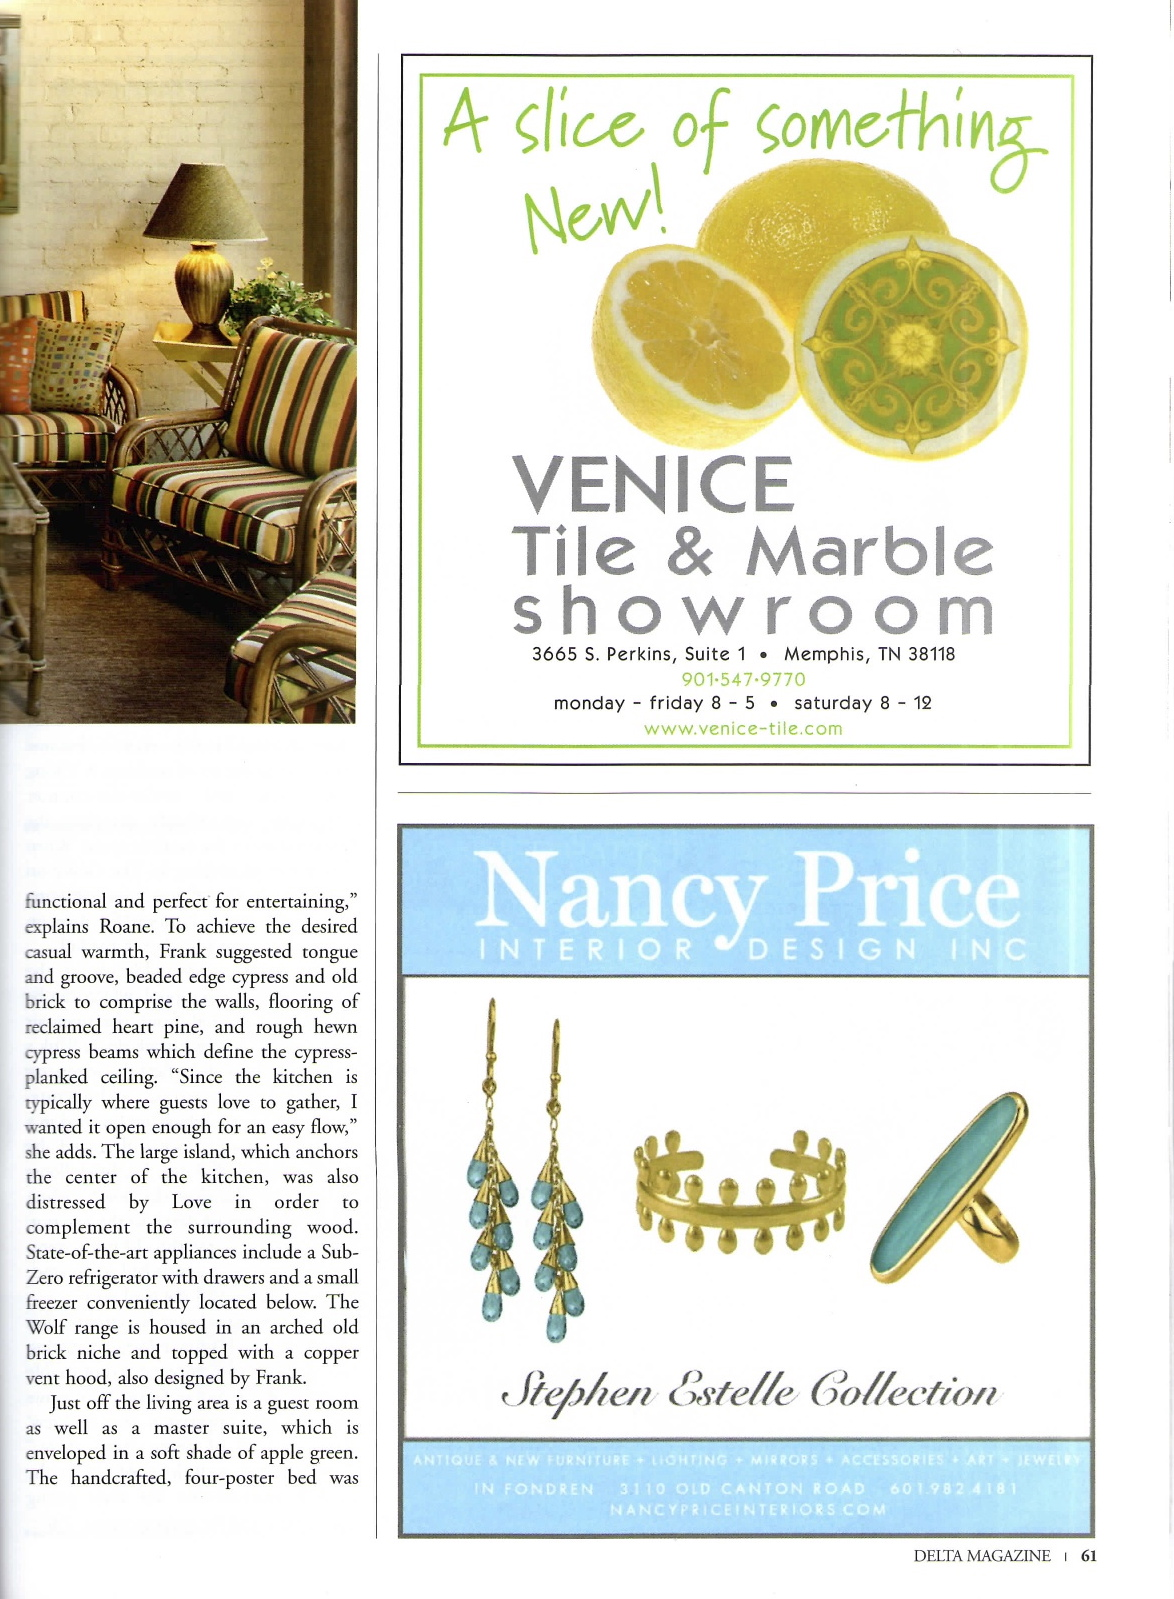 Grantham article - Delta Magazine -March April 2011 8.jpeg